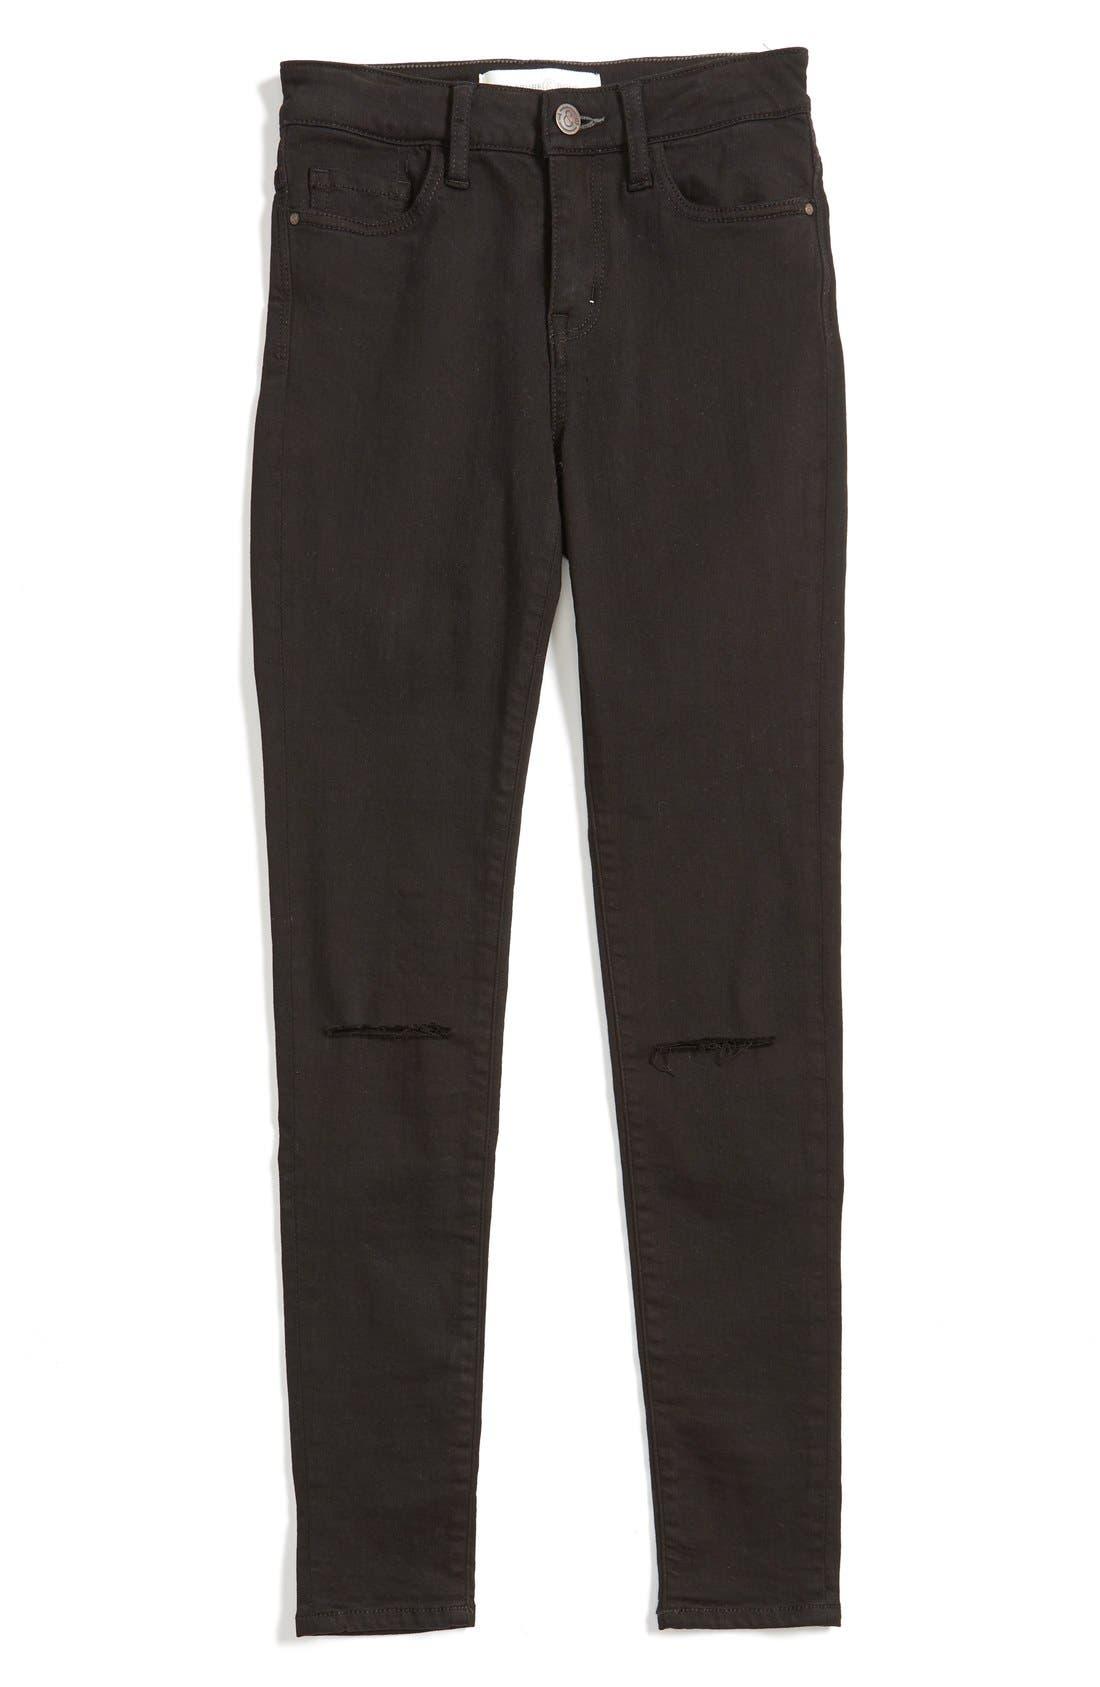 Treasure&Bond High Rise Skinny Jeans,                         Main,                         color, 001